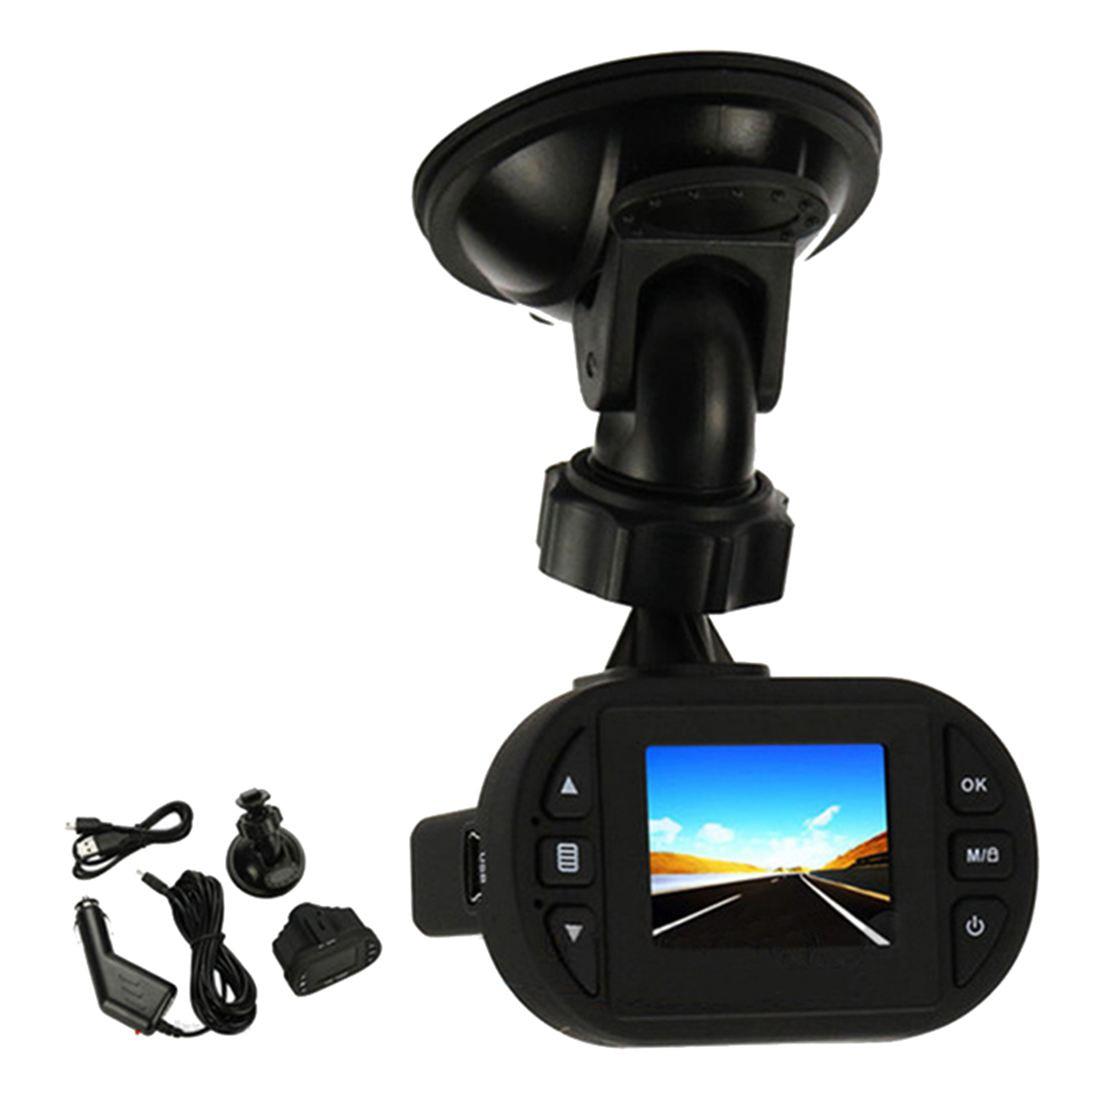 HD 1 5 Full 1080P LCD Car DVR Vehicle font b Camera b font Video Recorder